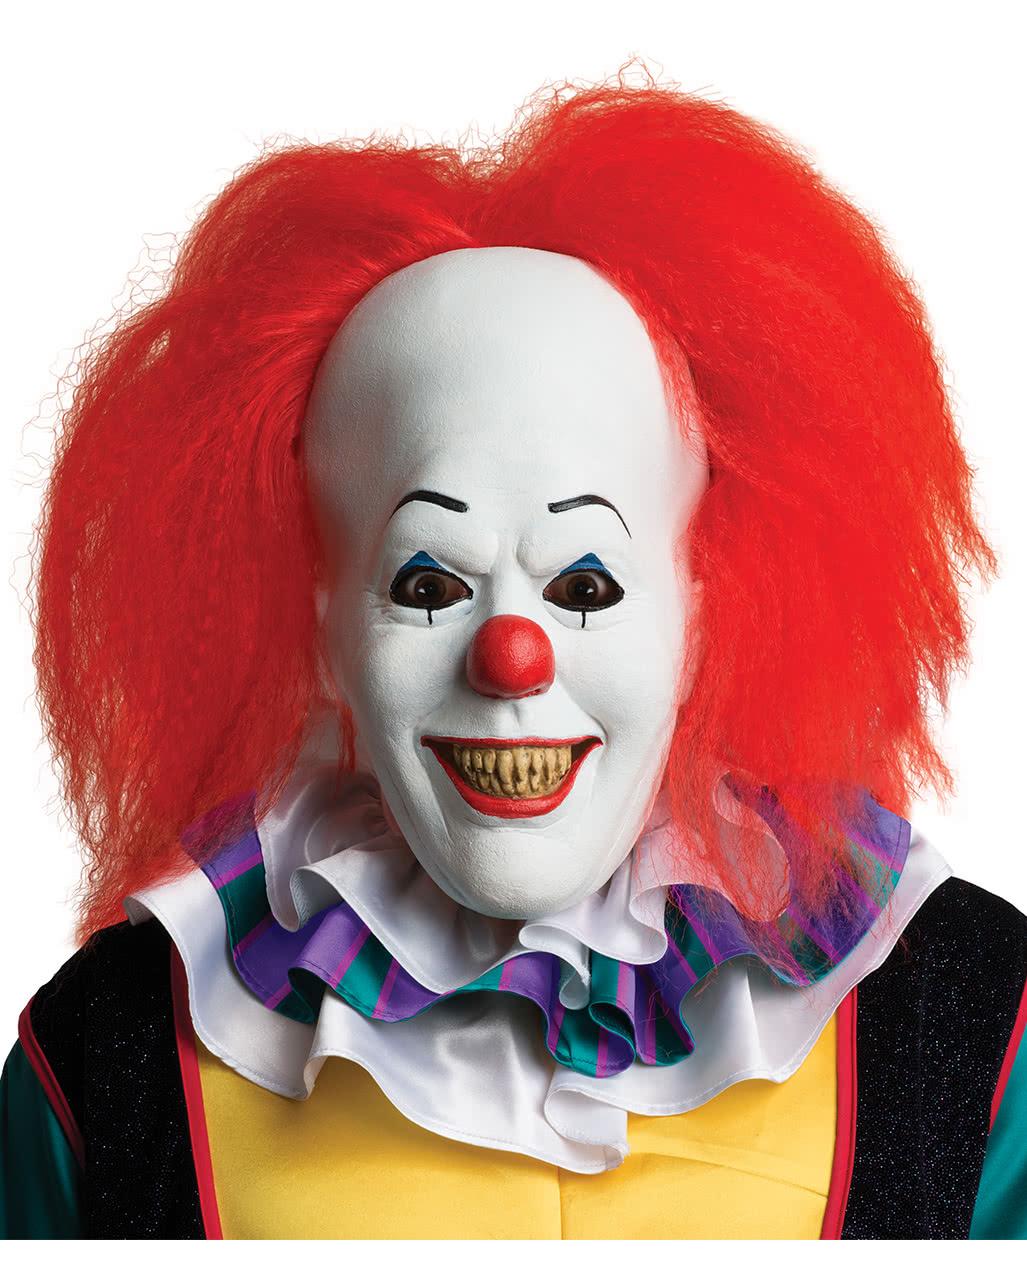 Pennywise Horror Clown Maske It Horror Masken Aus Hollywood